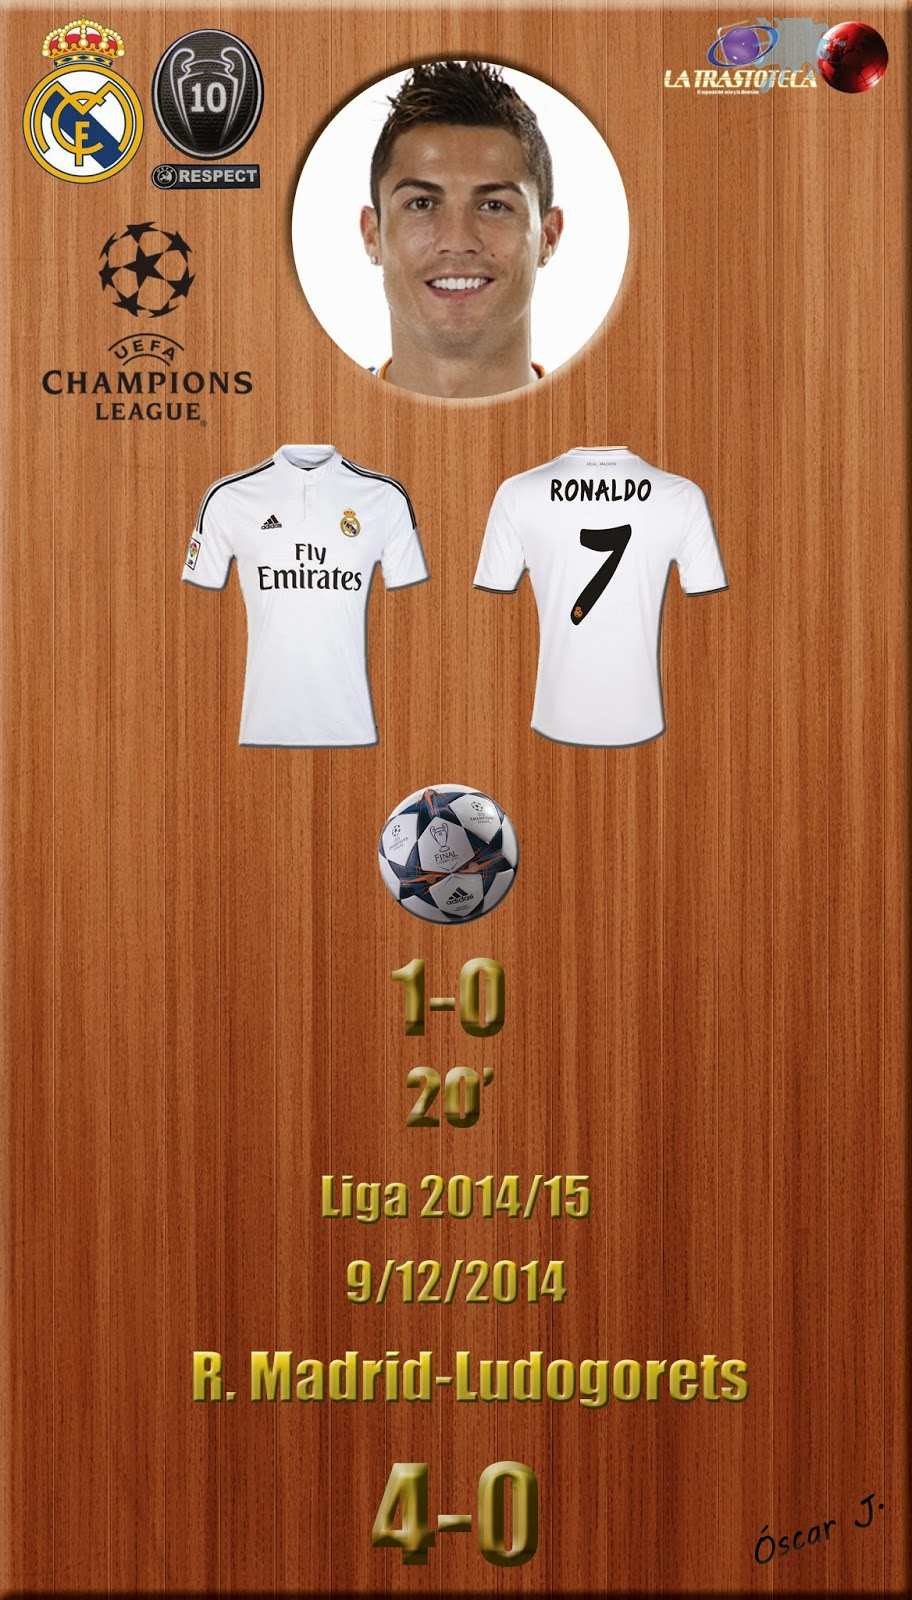 Cristiano Ronaldo - (1-0) - Real Madrid 4-0 Ludogorets - Champions League 2014/15 - Jornada 6 - (9/12/2014)